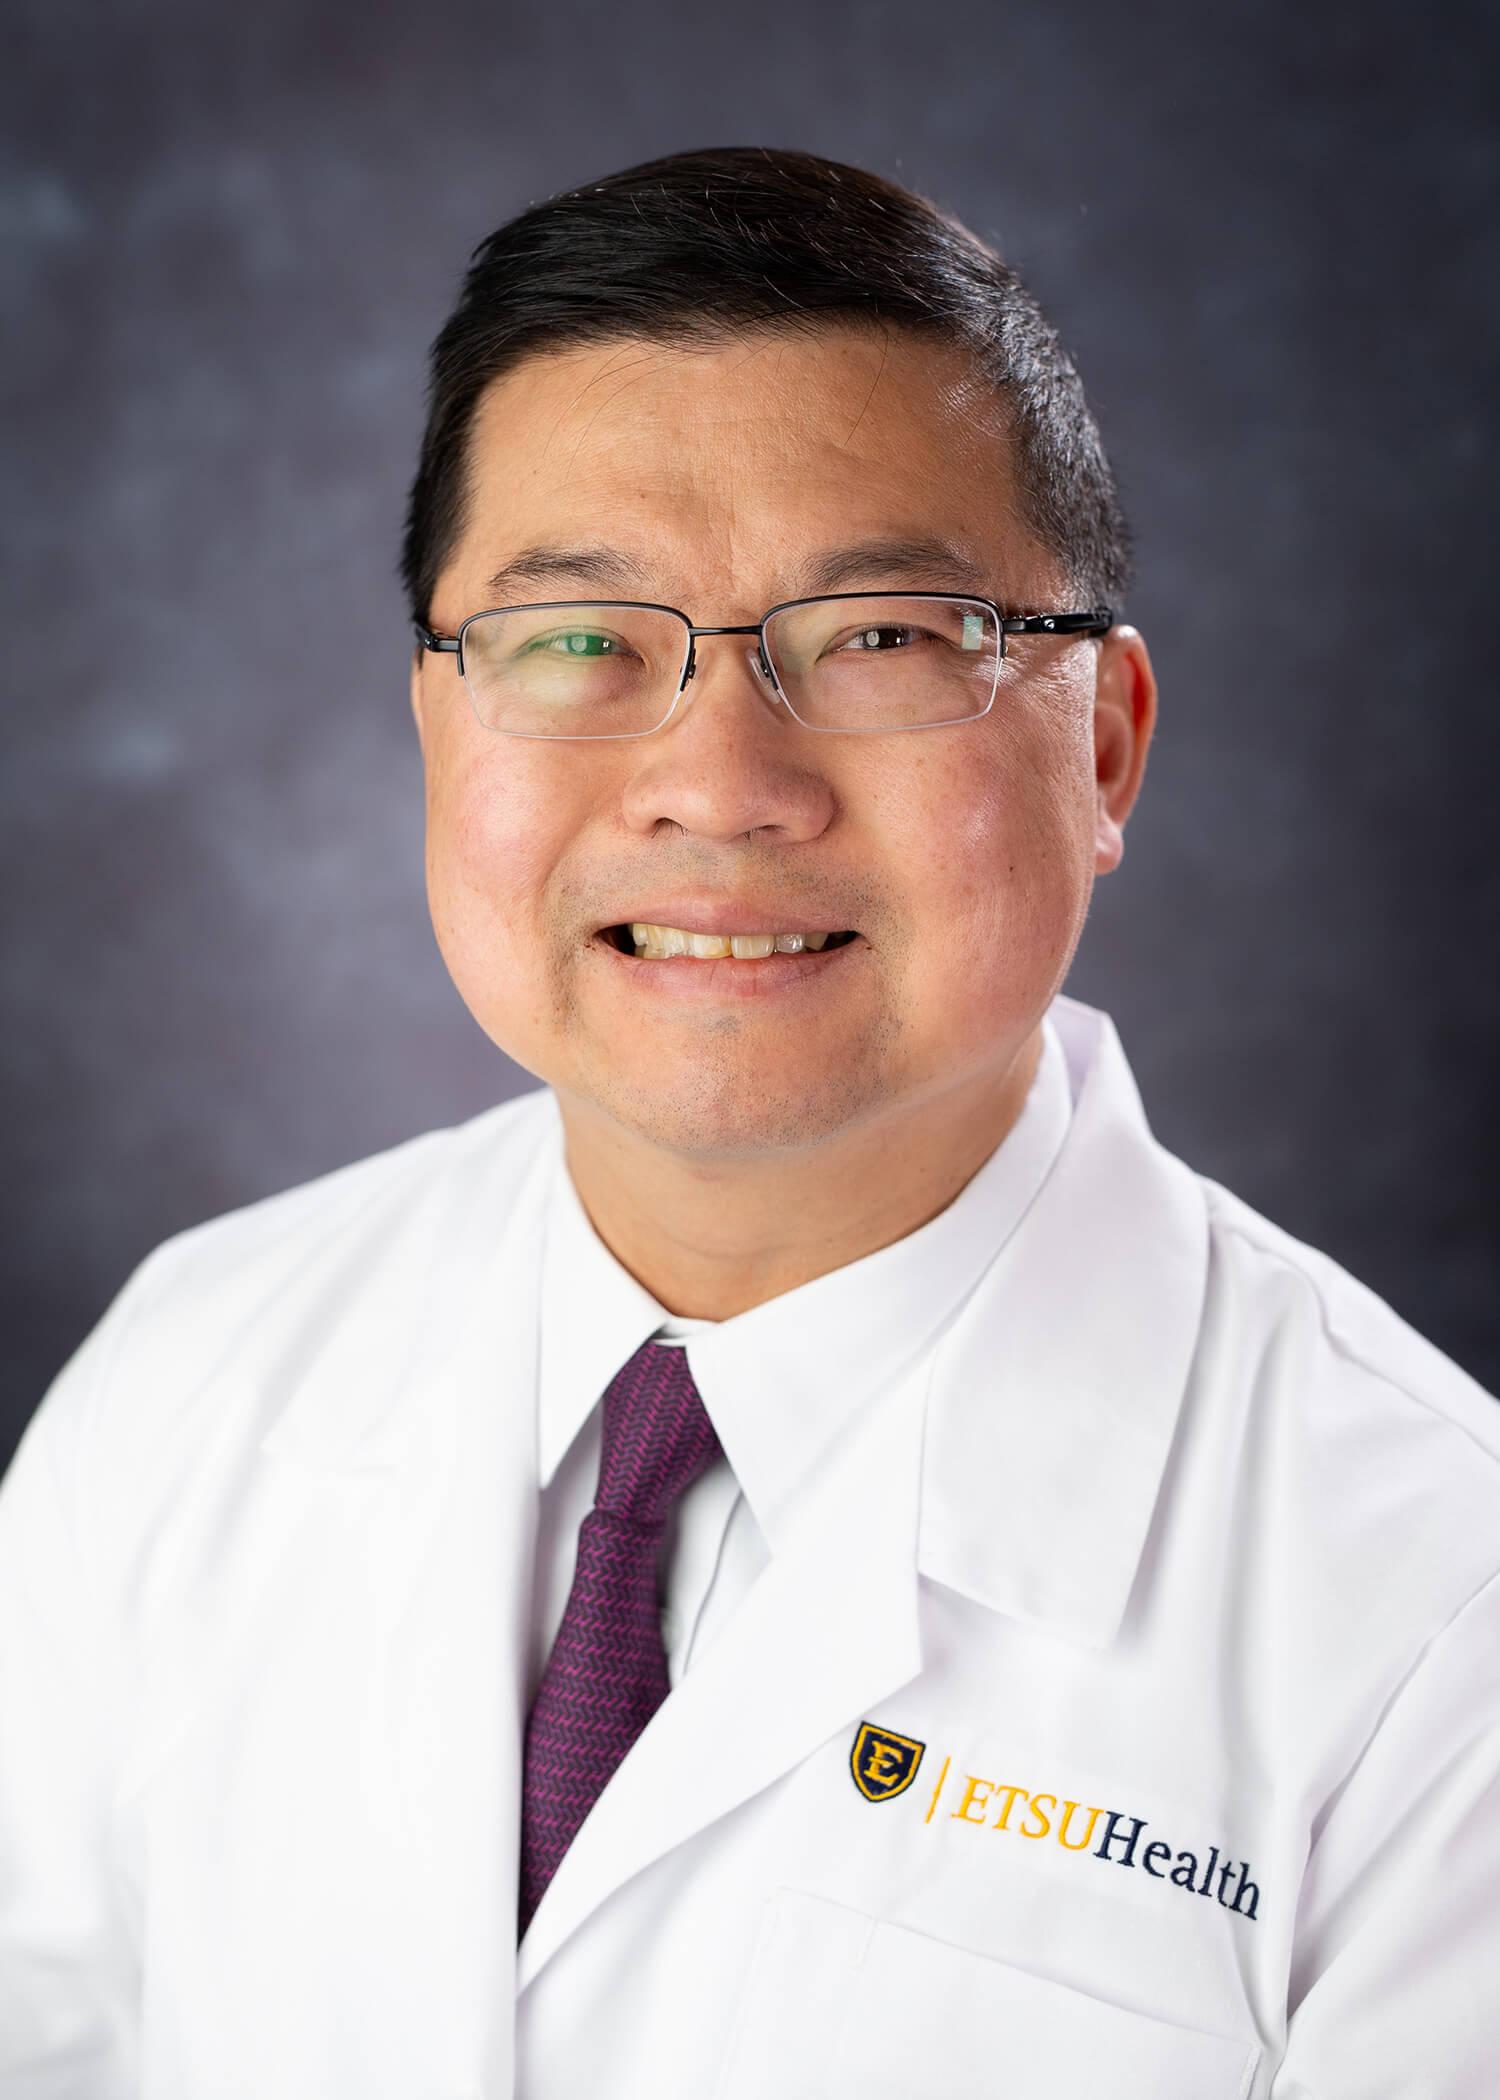 Photo of Joseph Lee, M.D.